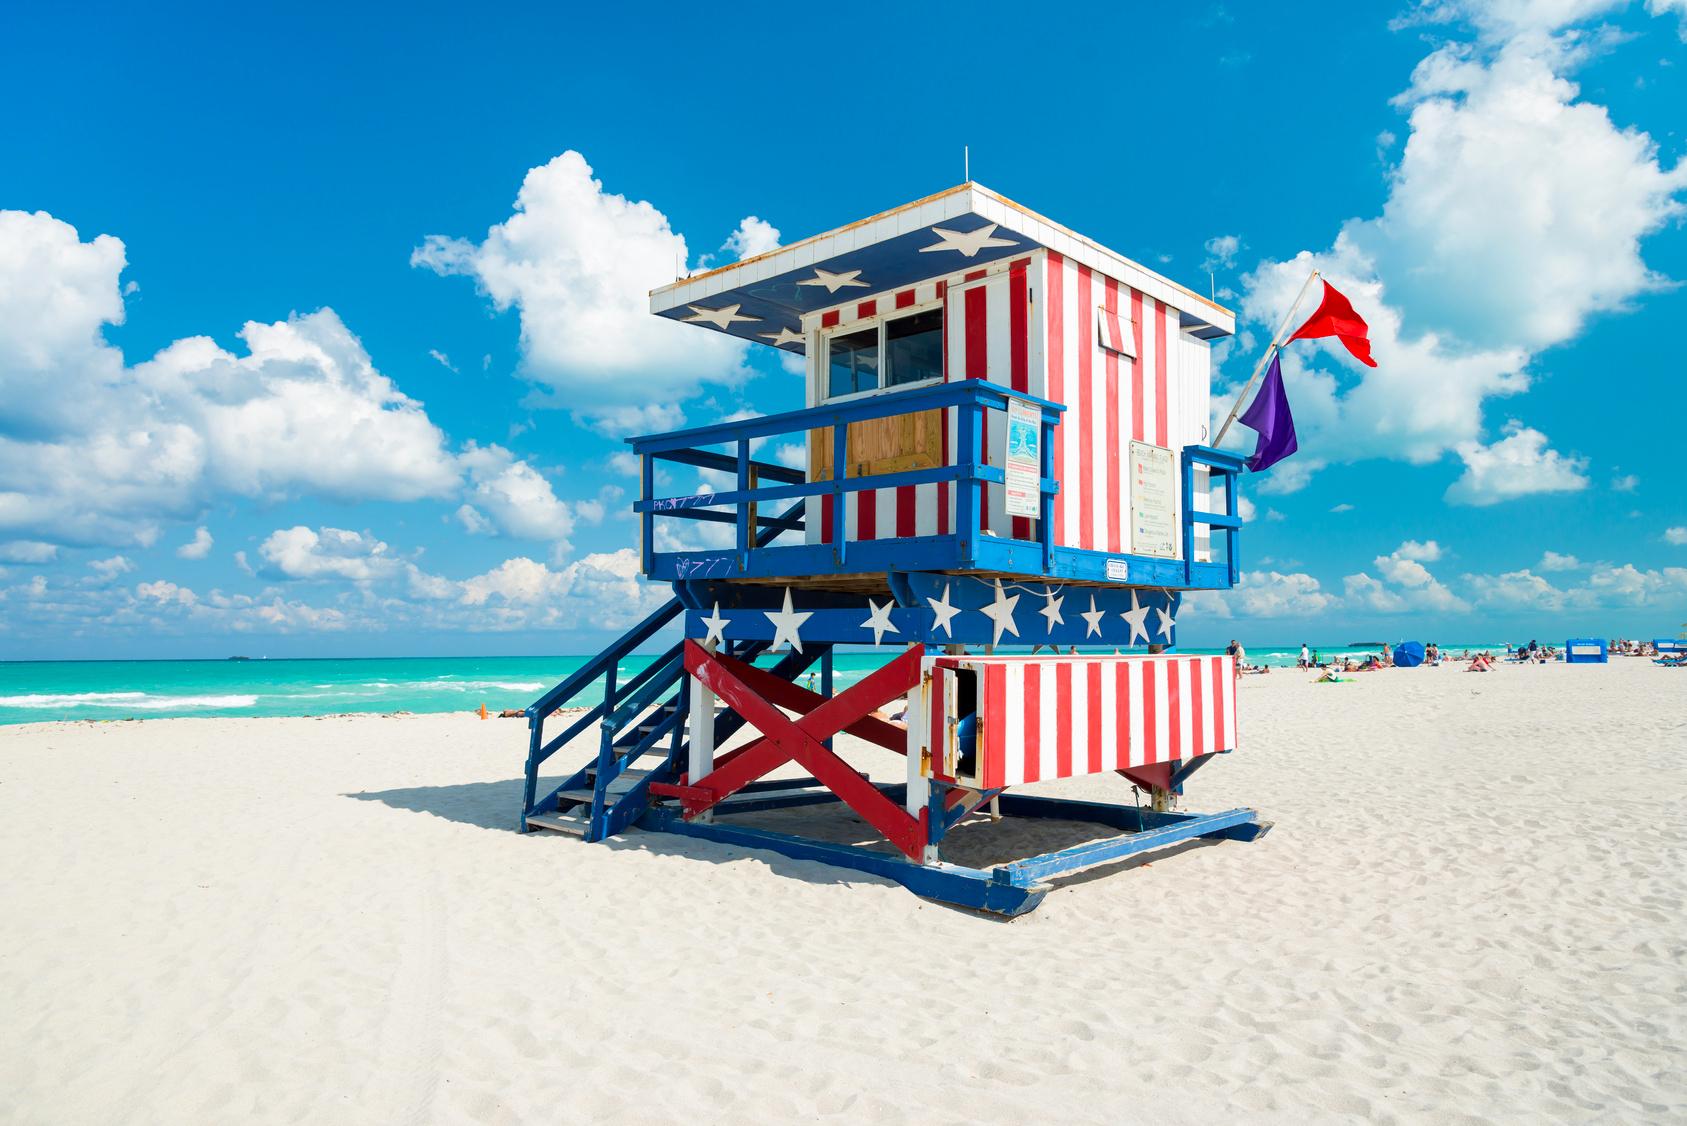 South Beach, Miami Florida